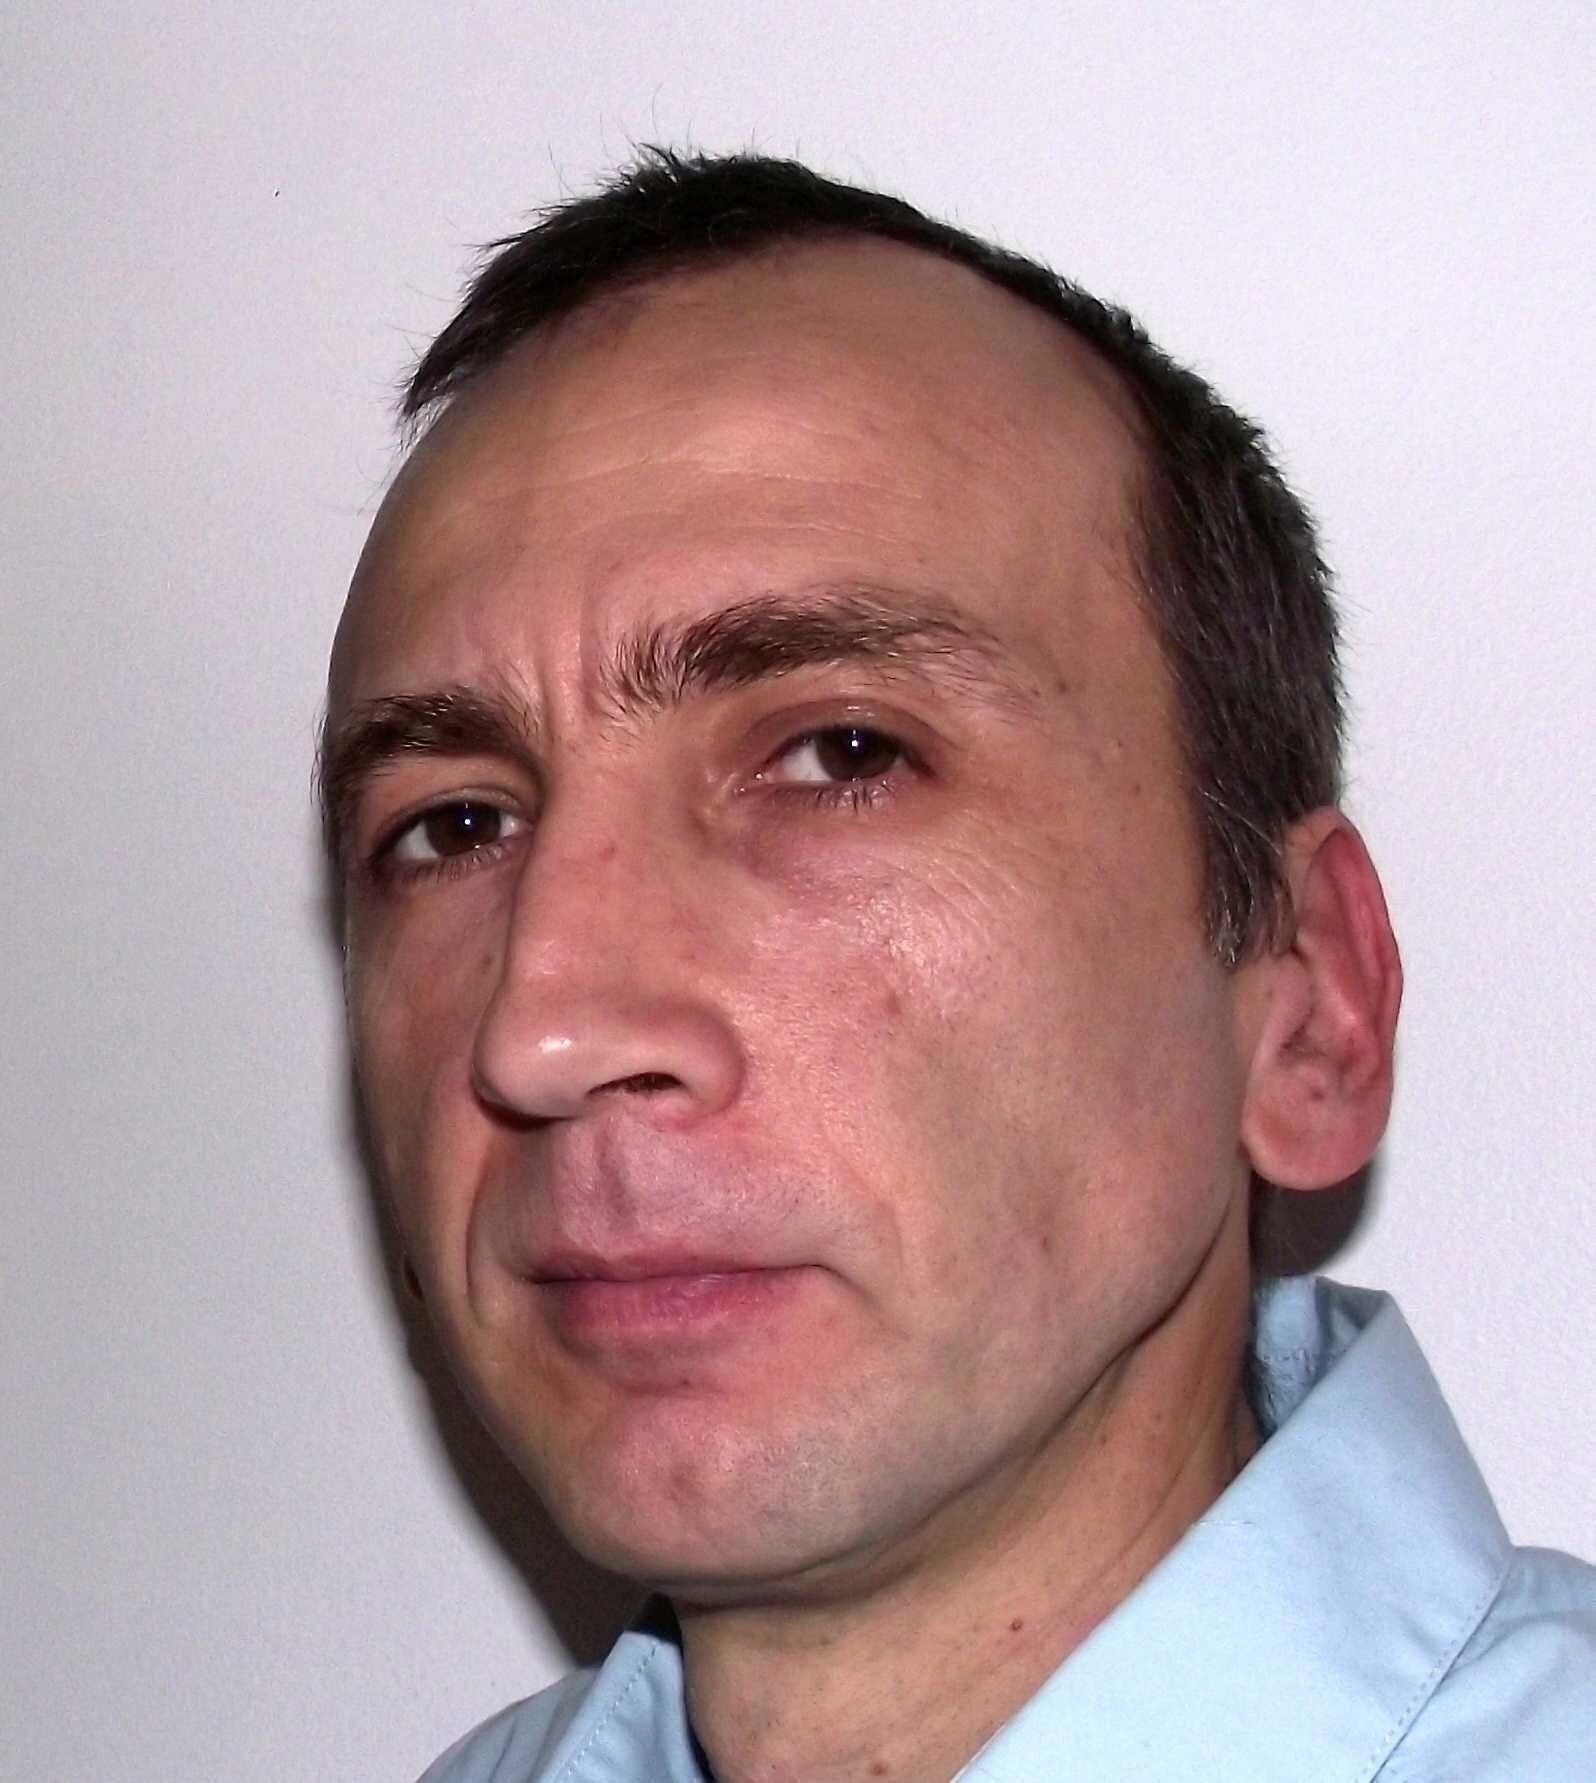 Samir Begic